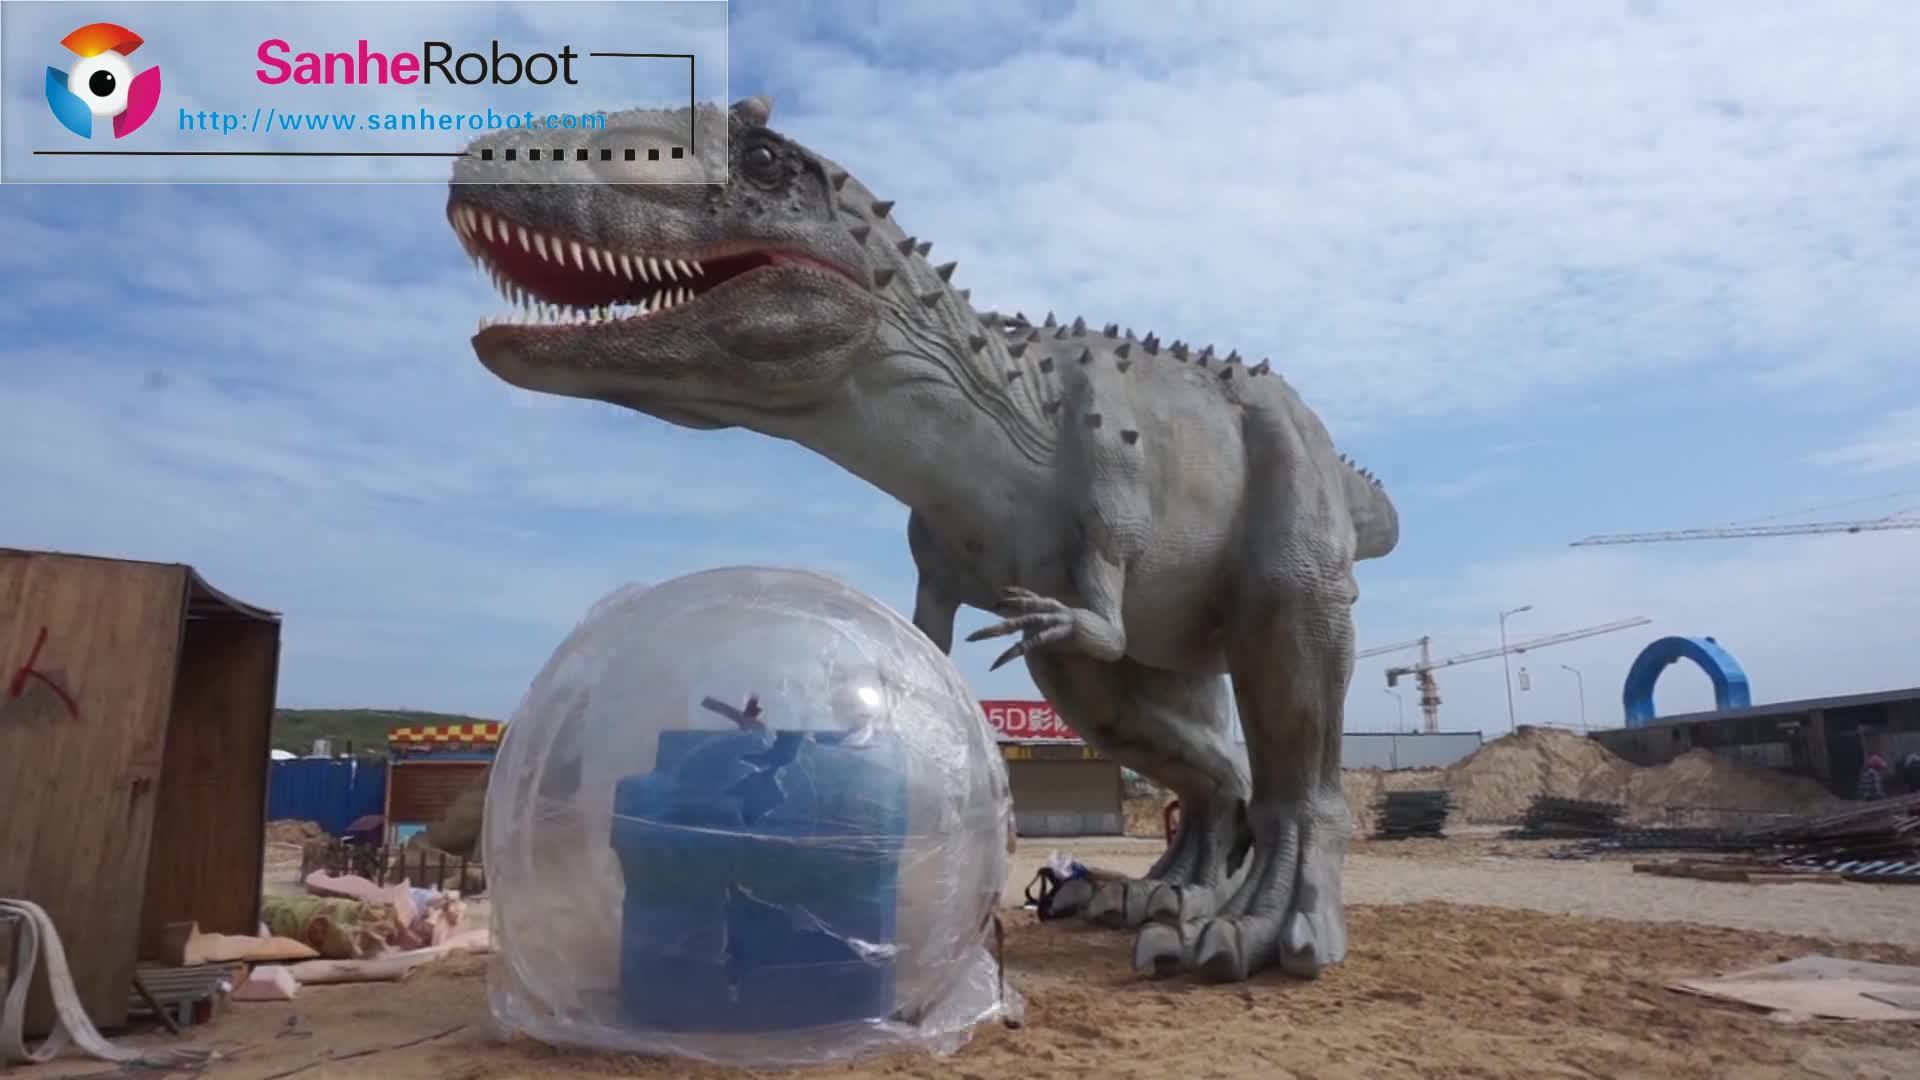 Life-size Robotic T-rex The Good Dinosaur King Sex - Buy Dinosaur ...